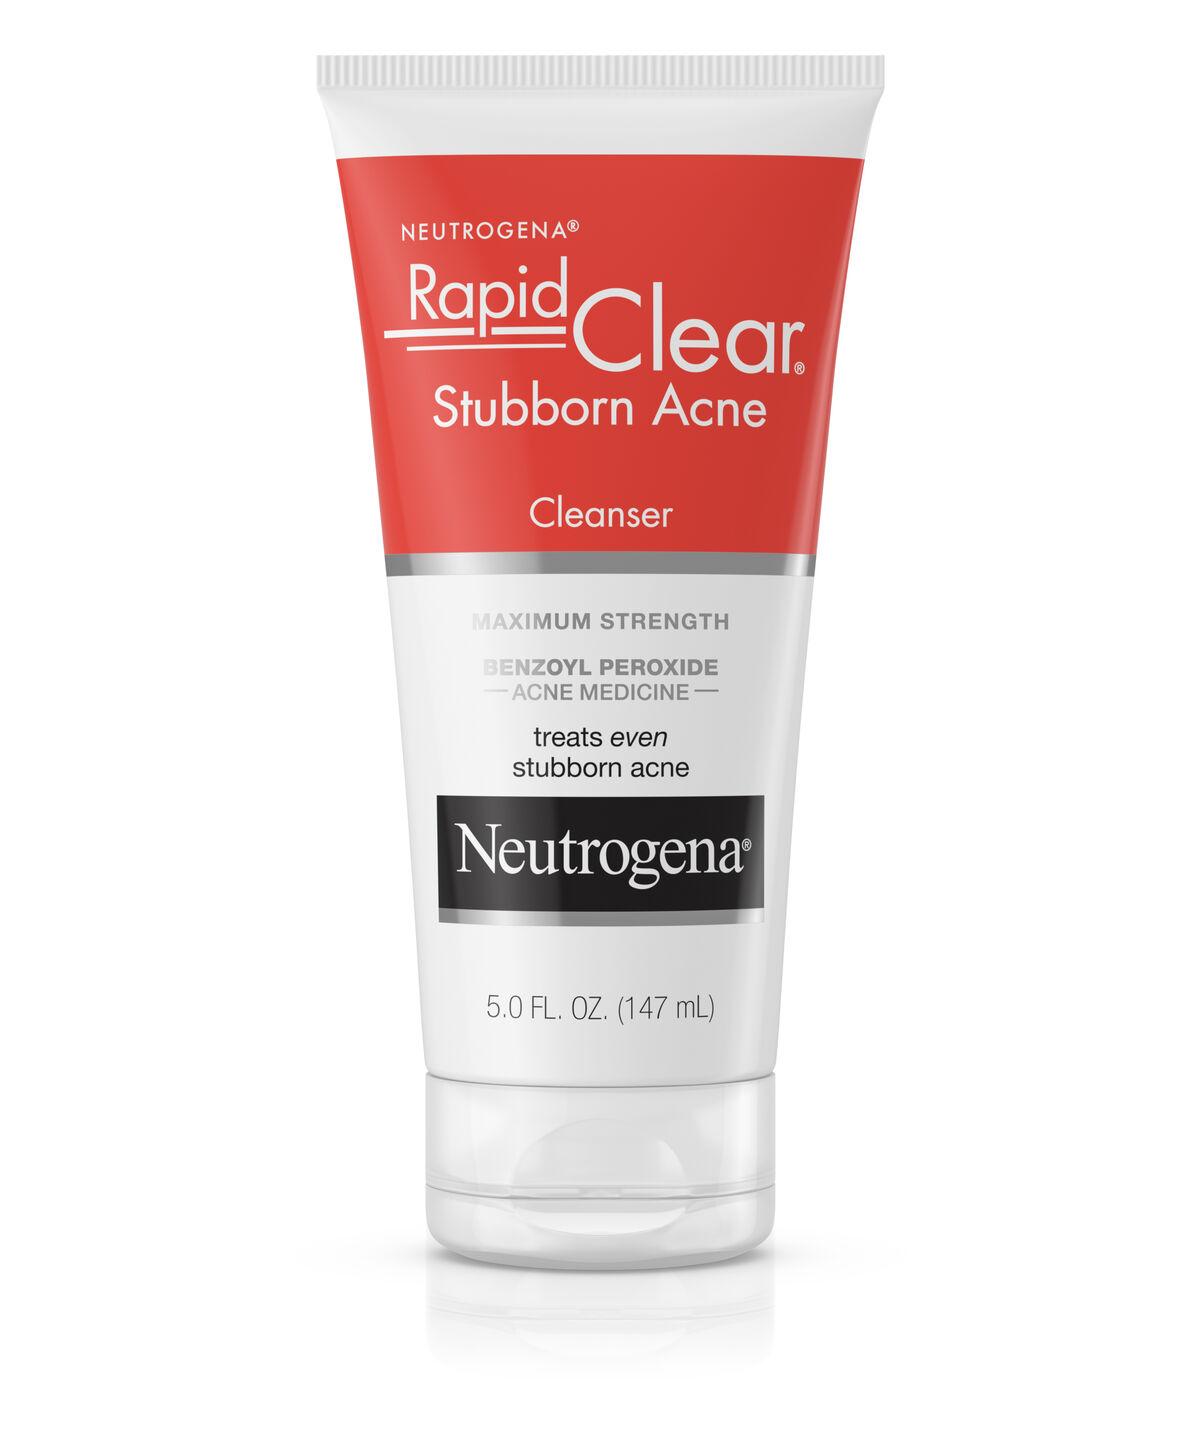 Neutrogena Rapid Clear 174 Stubborn Acne Cleanser Neutrogena 174